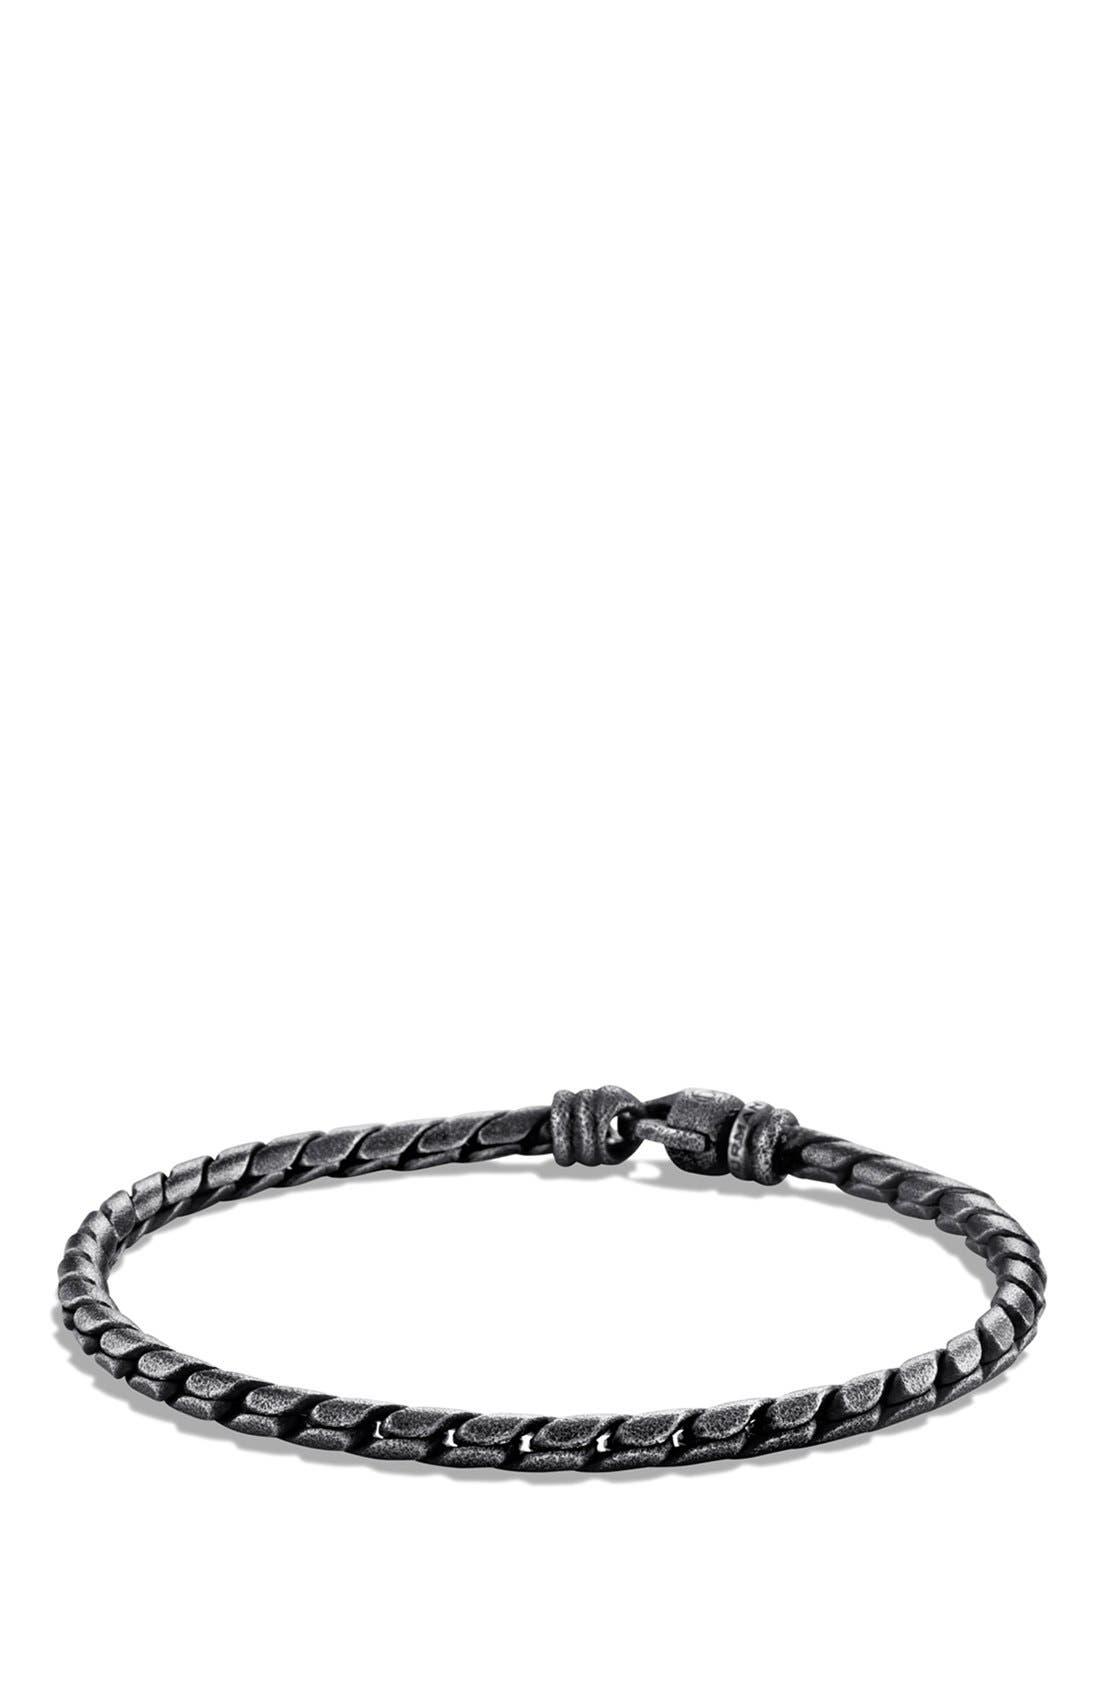 Main Image - David Yurman 'Chain' Cobra Chain Bracelet